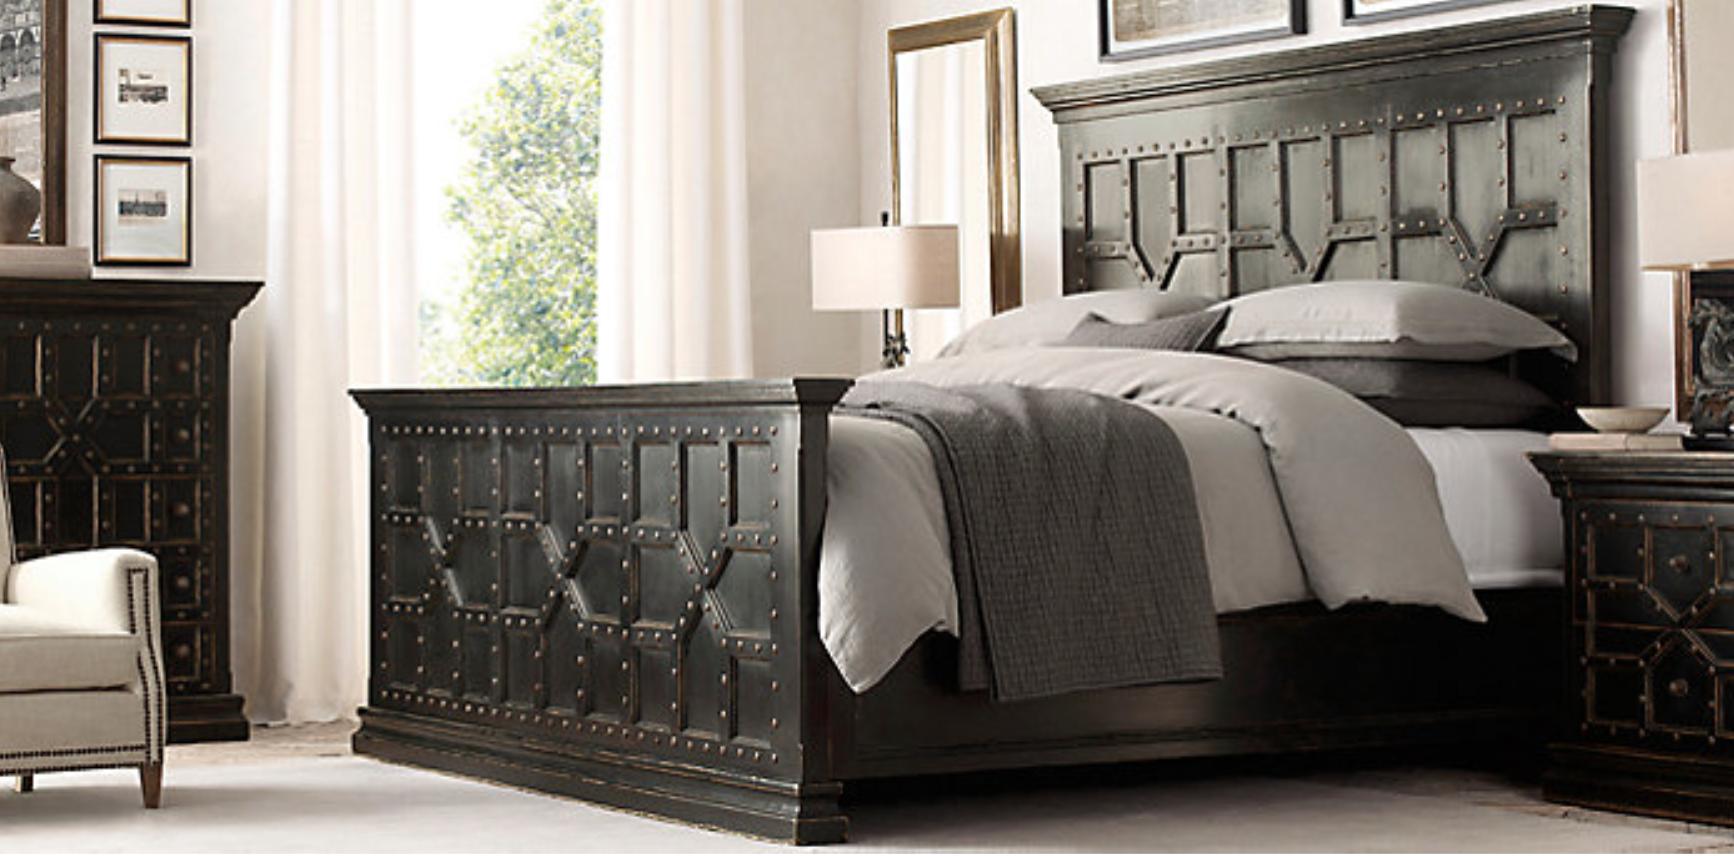 Restoration Hardware 17TH C. Castello Bed shown in